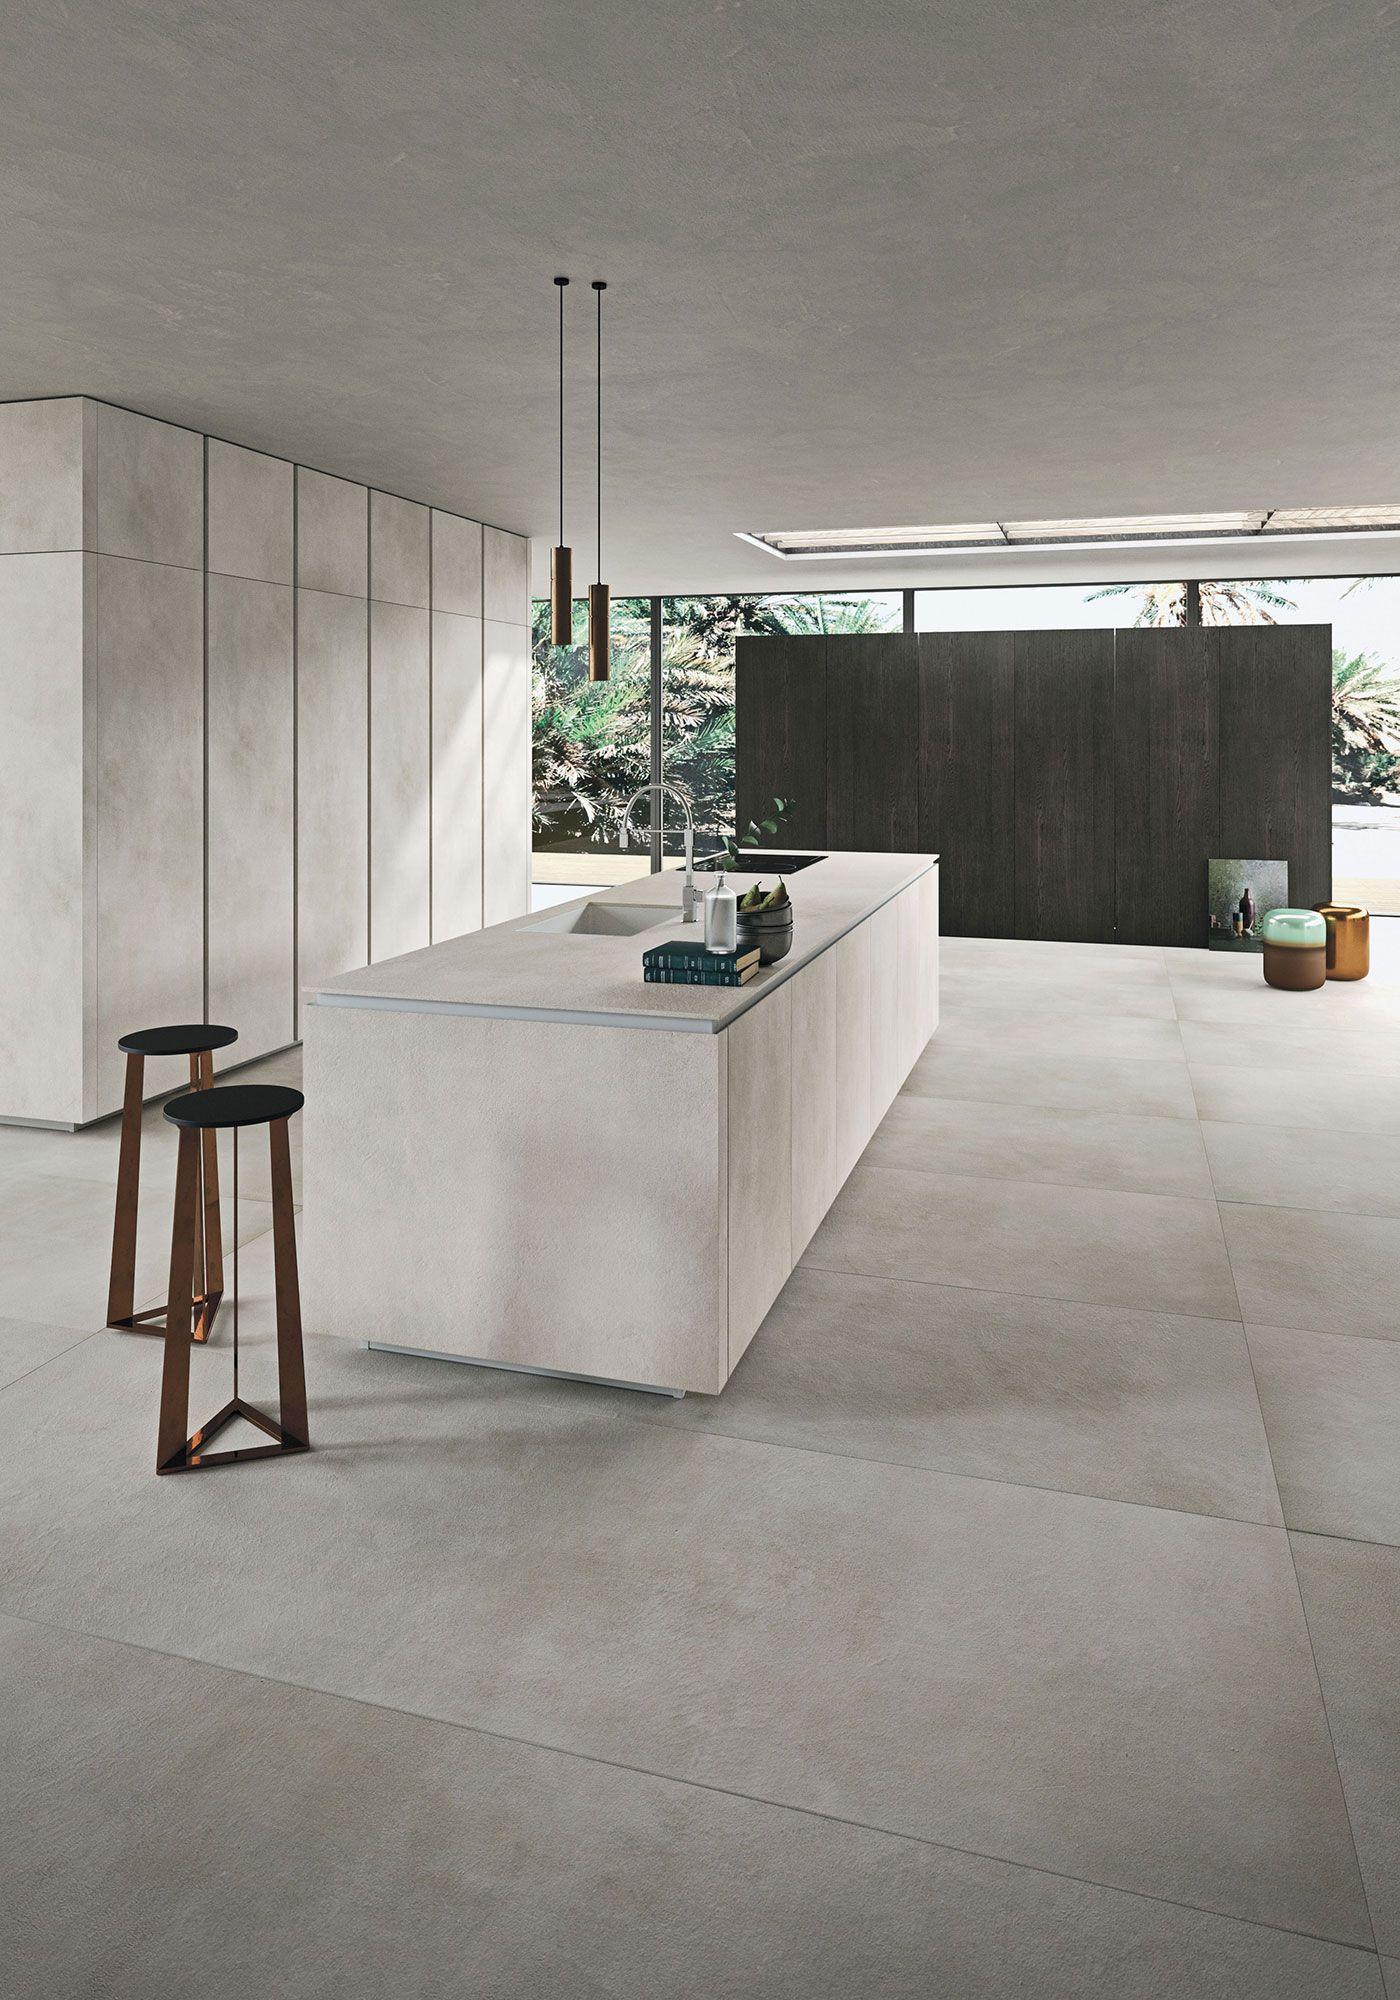 Deco Salle De Bain Beige Et Marron ~ Design Kitchens Snaidero Way Materia Photo 1 Architecture